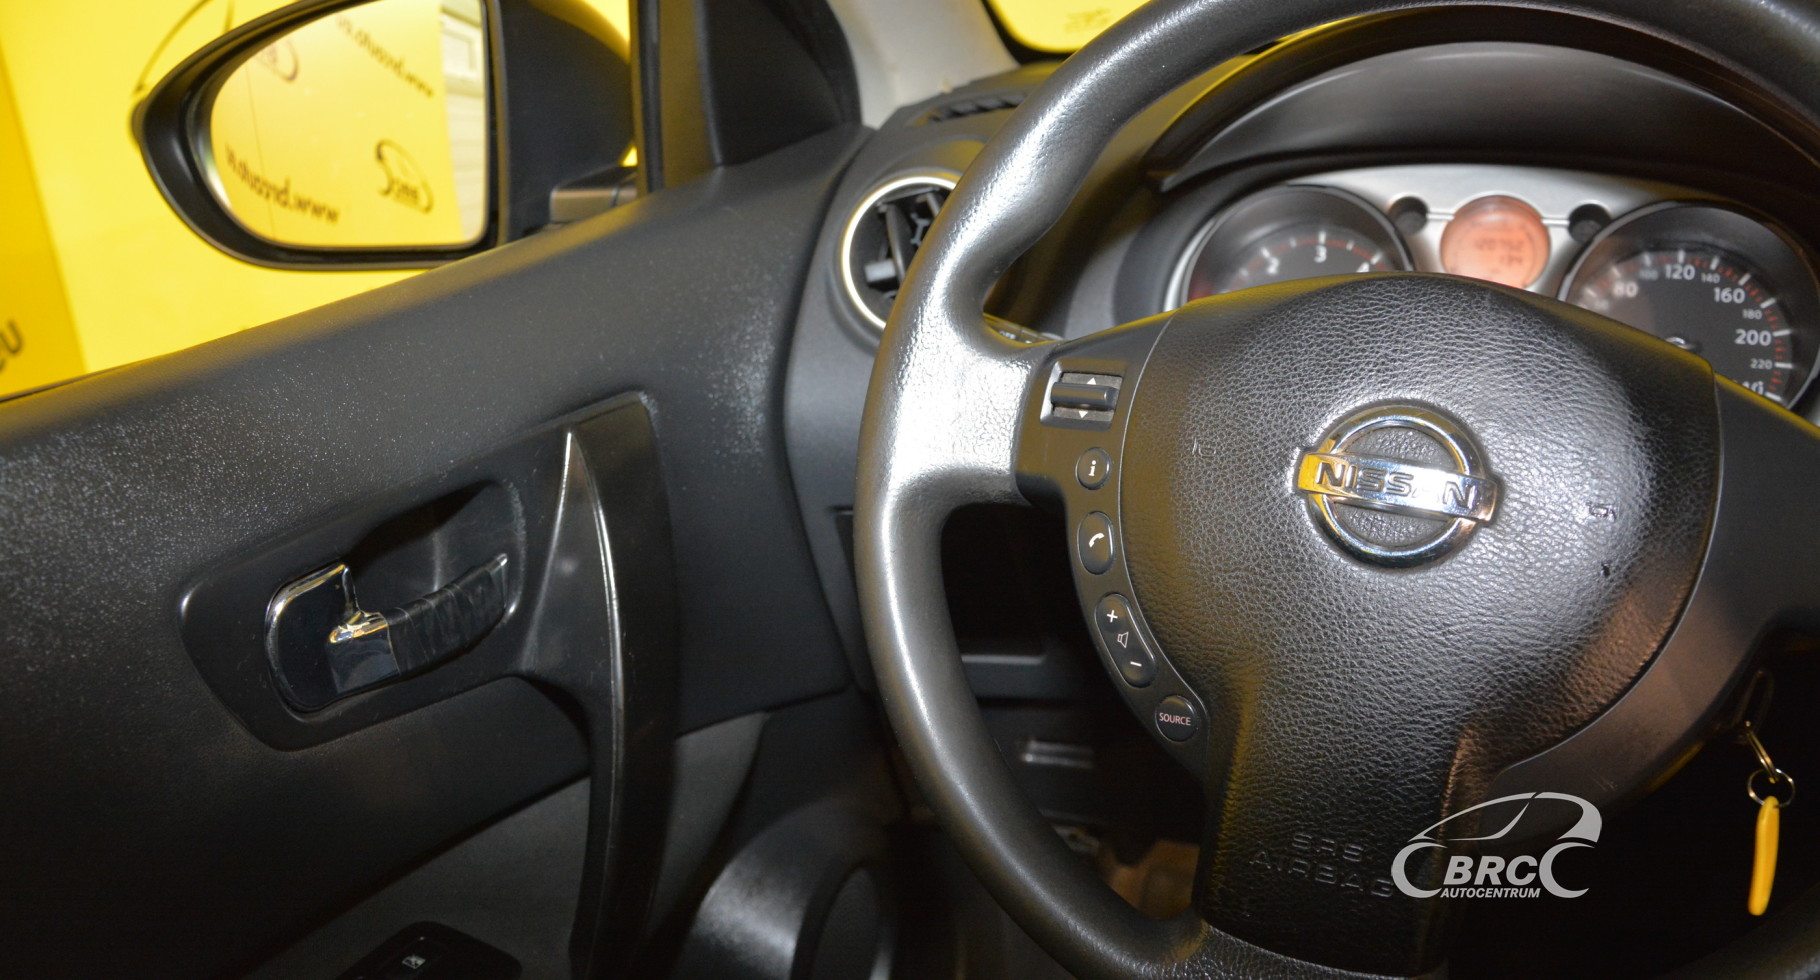 Nissan Qashqai 1.6 dCi A/C